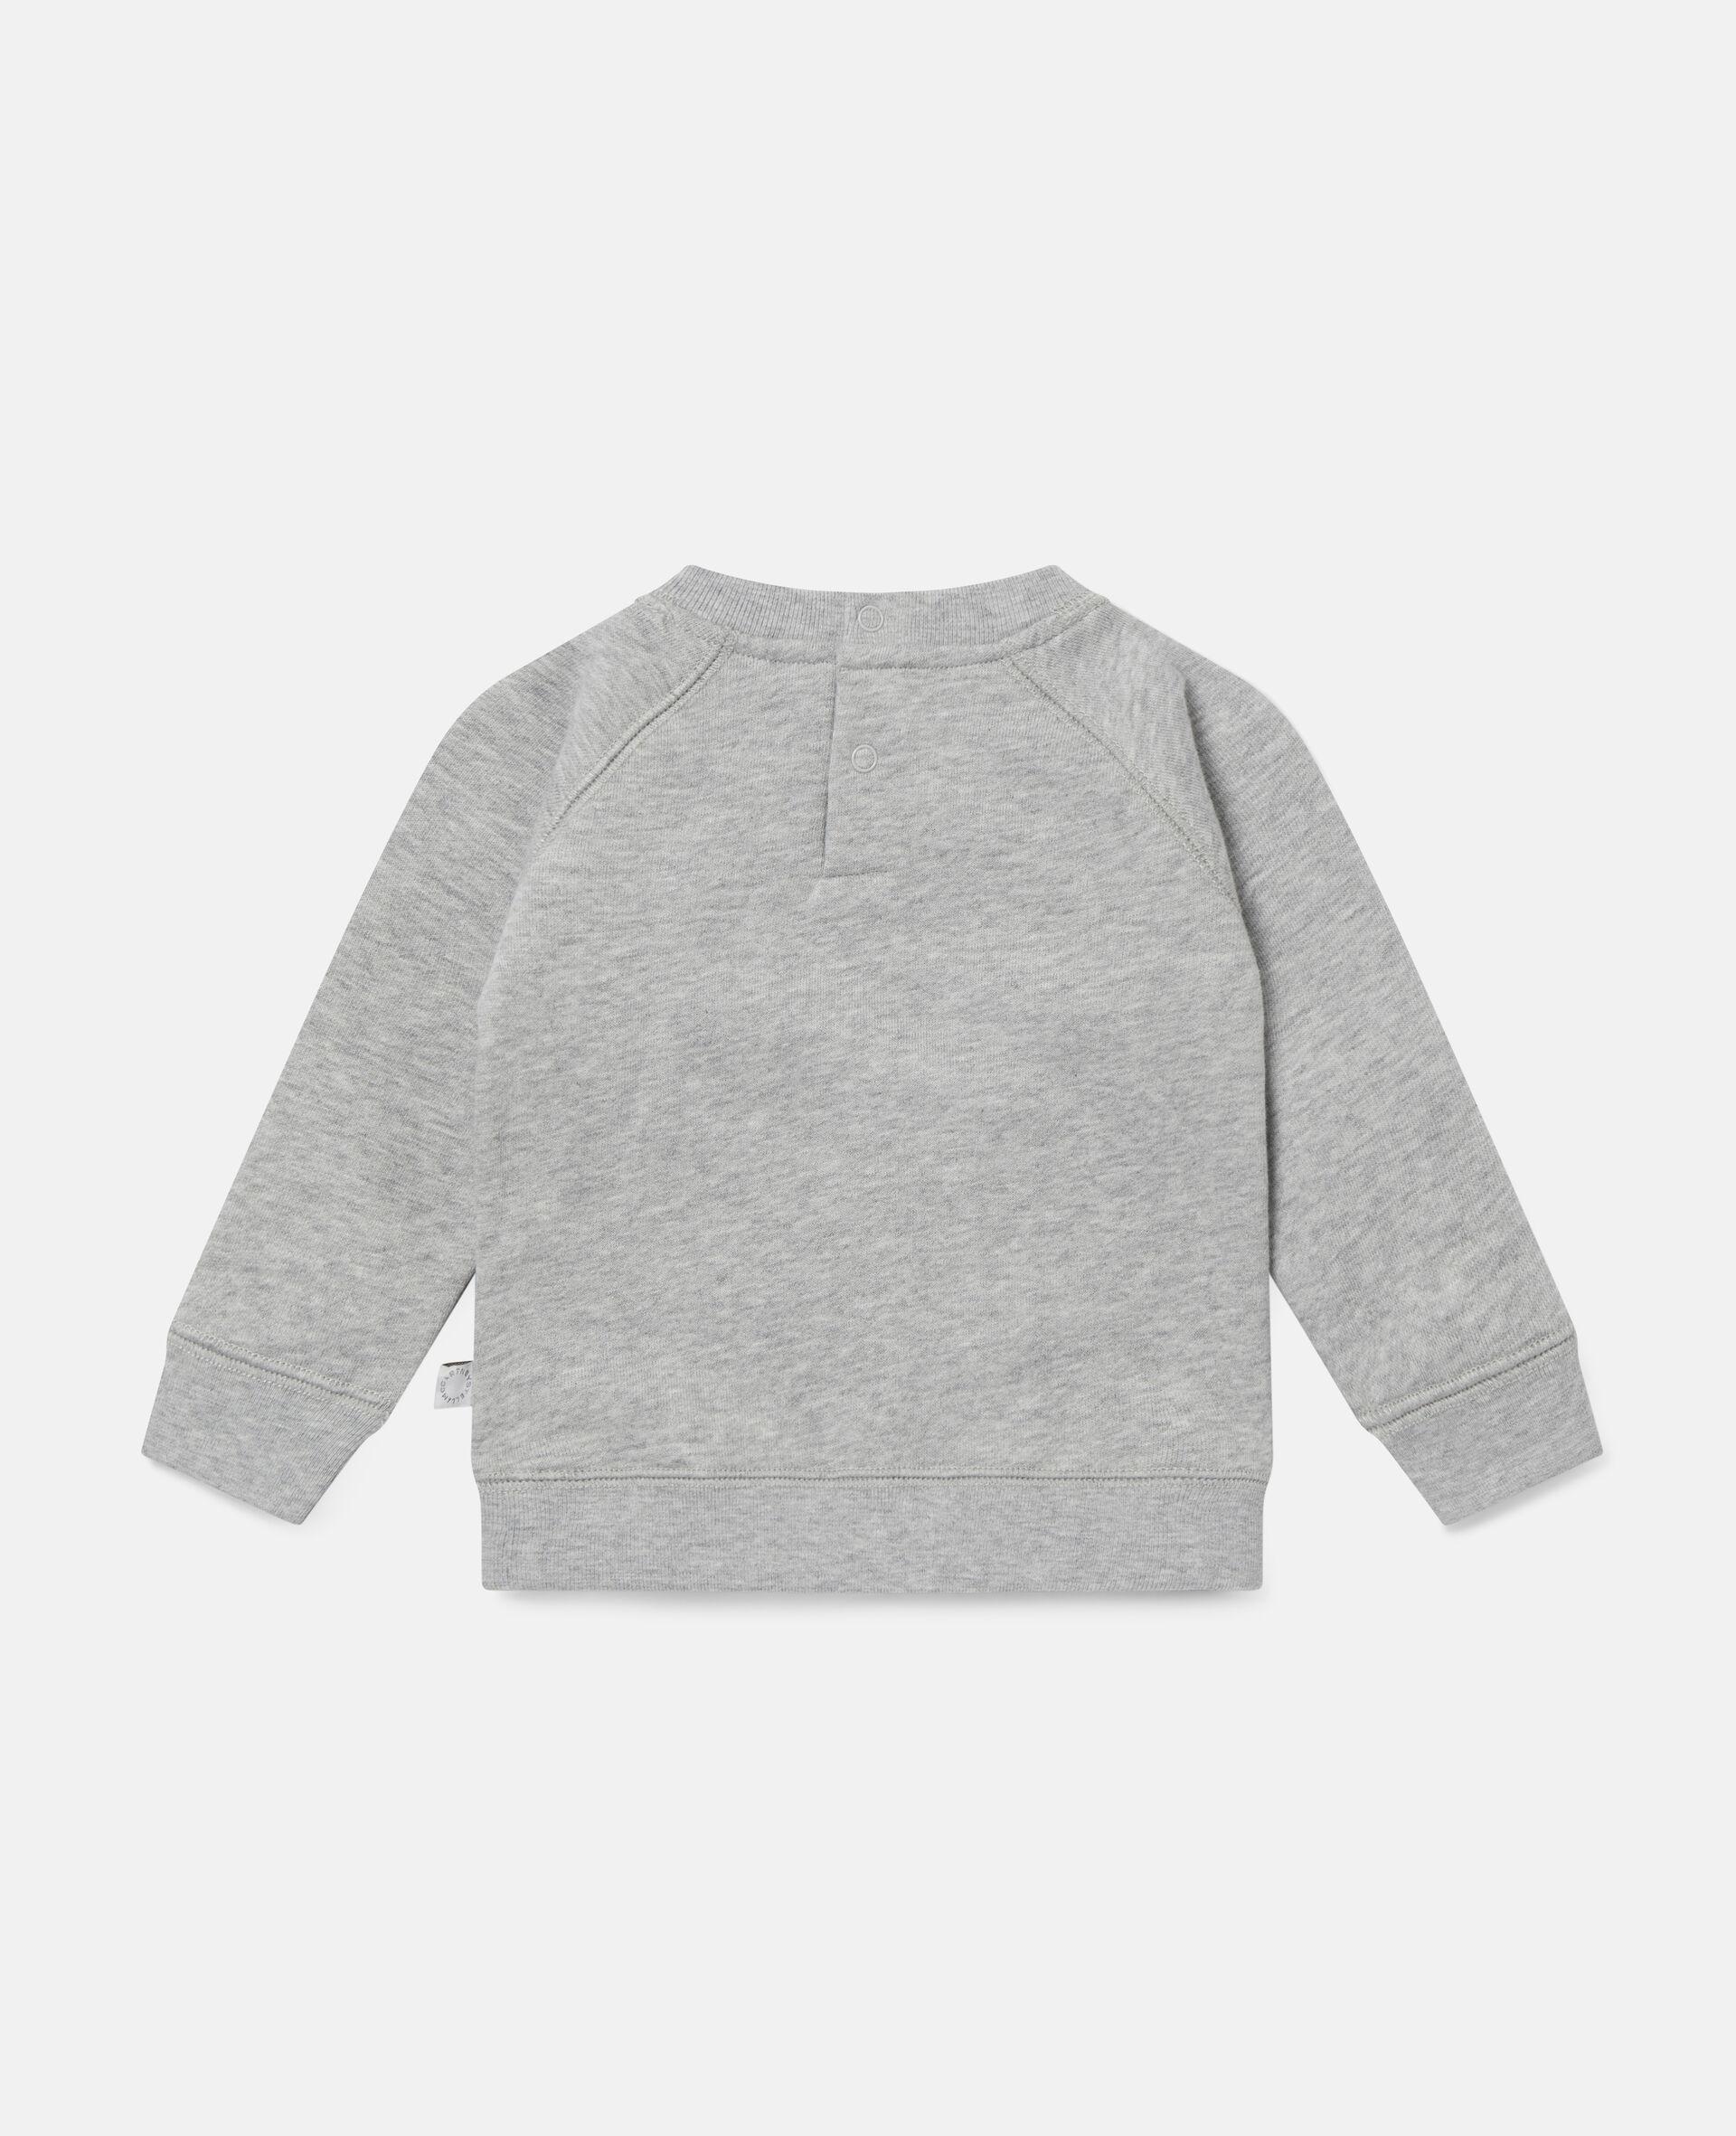 Painting Tubes Fleece Sweatshirt-Grey-large image number 3